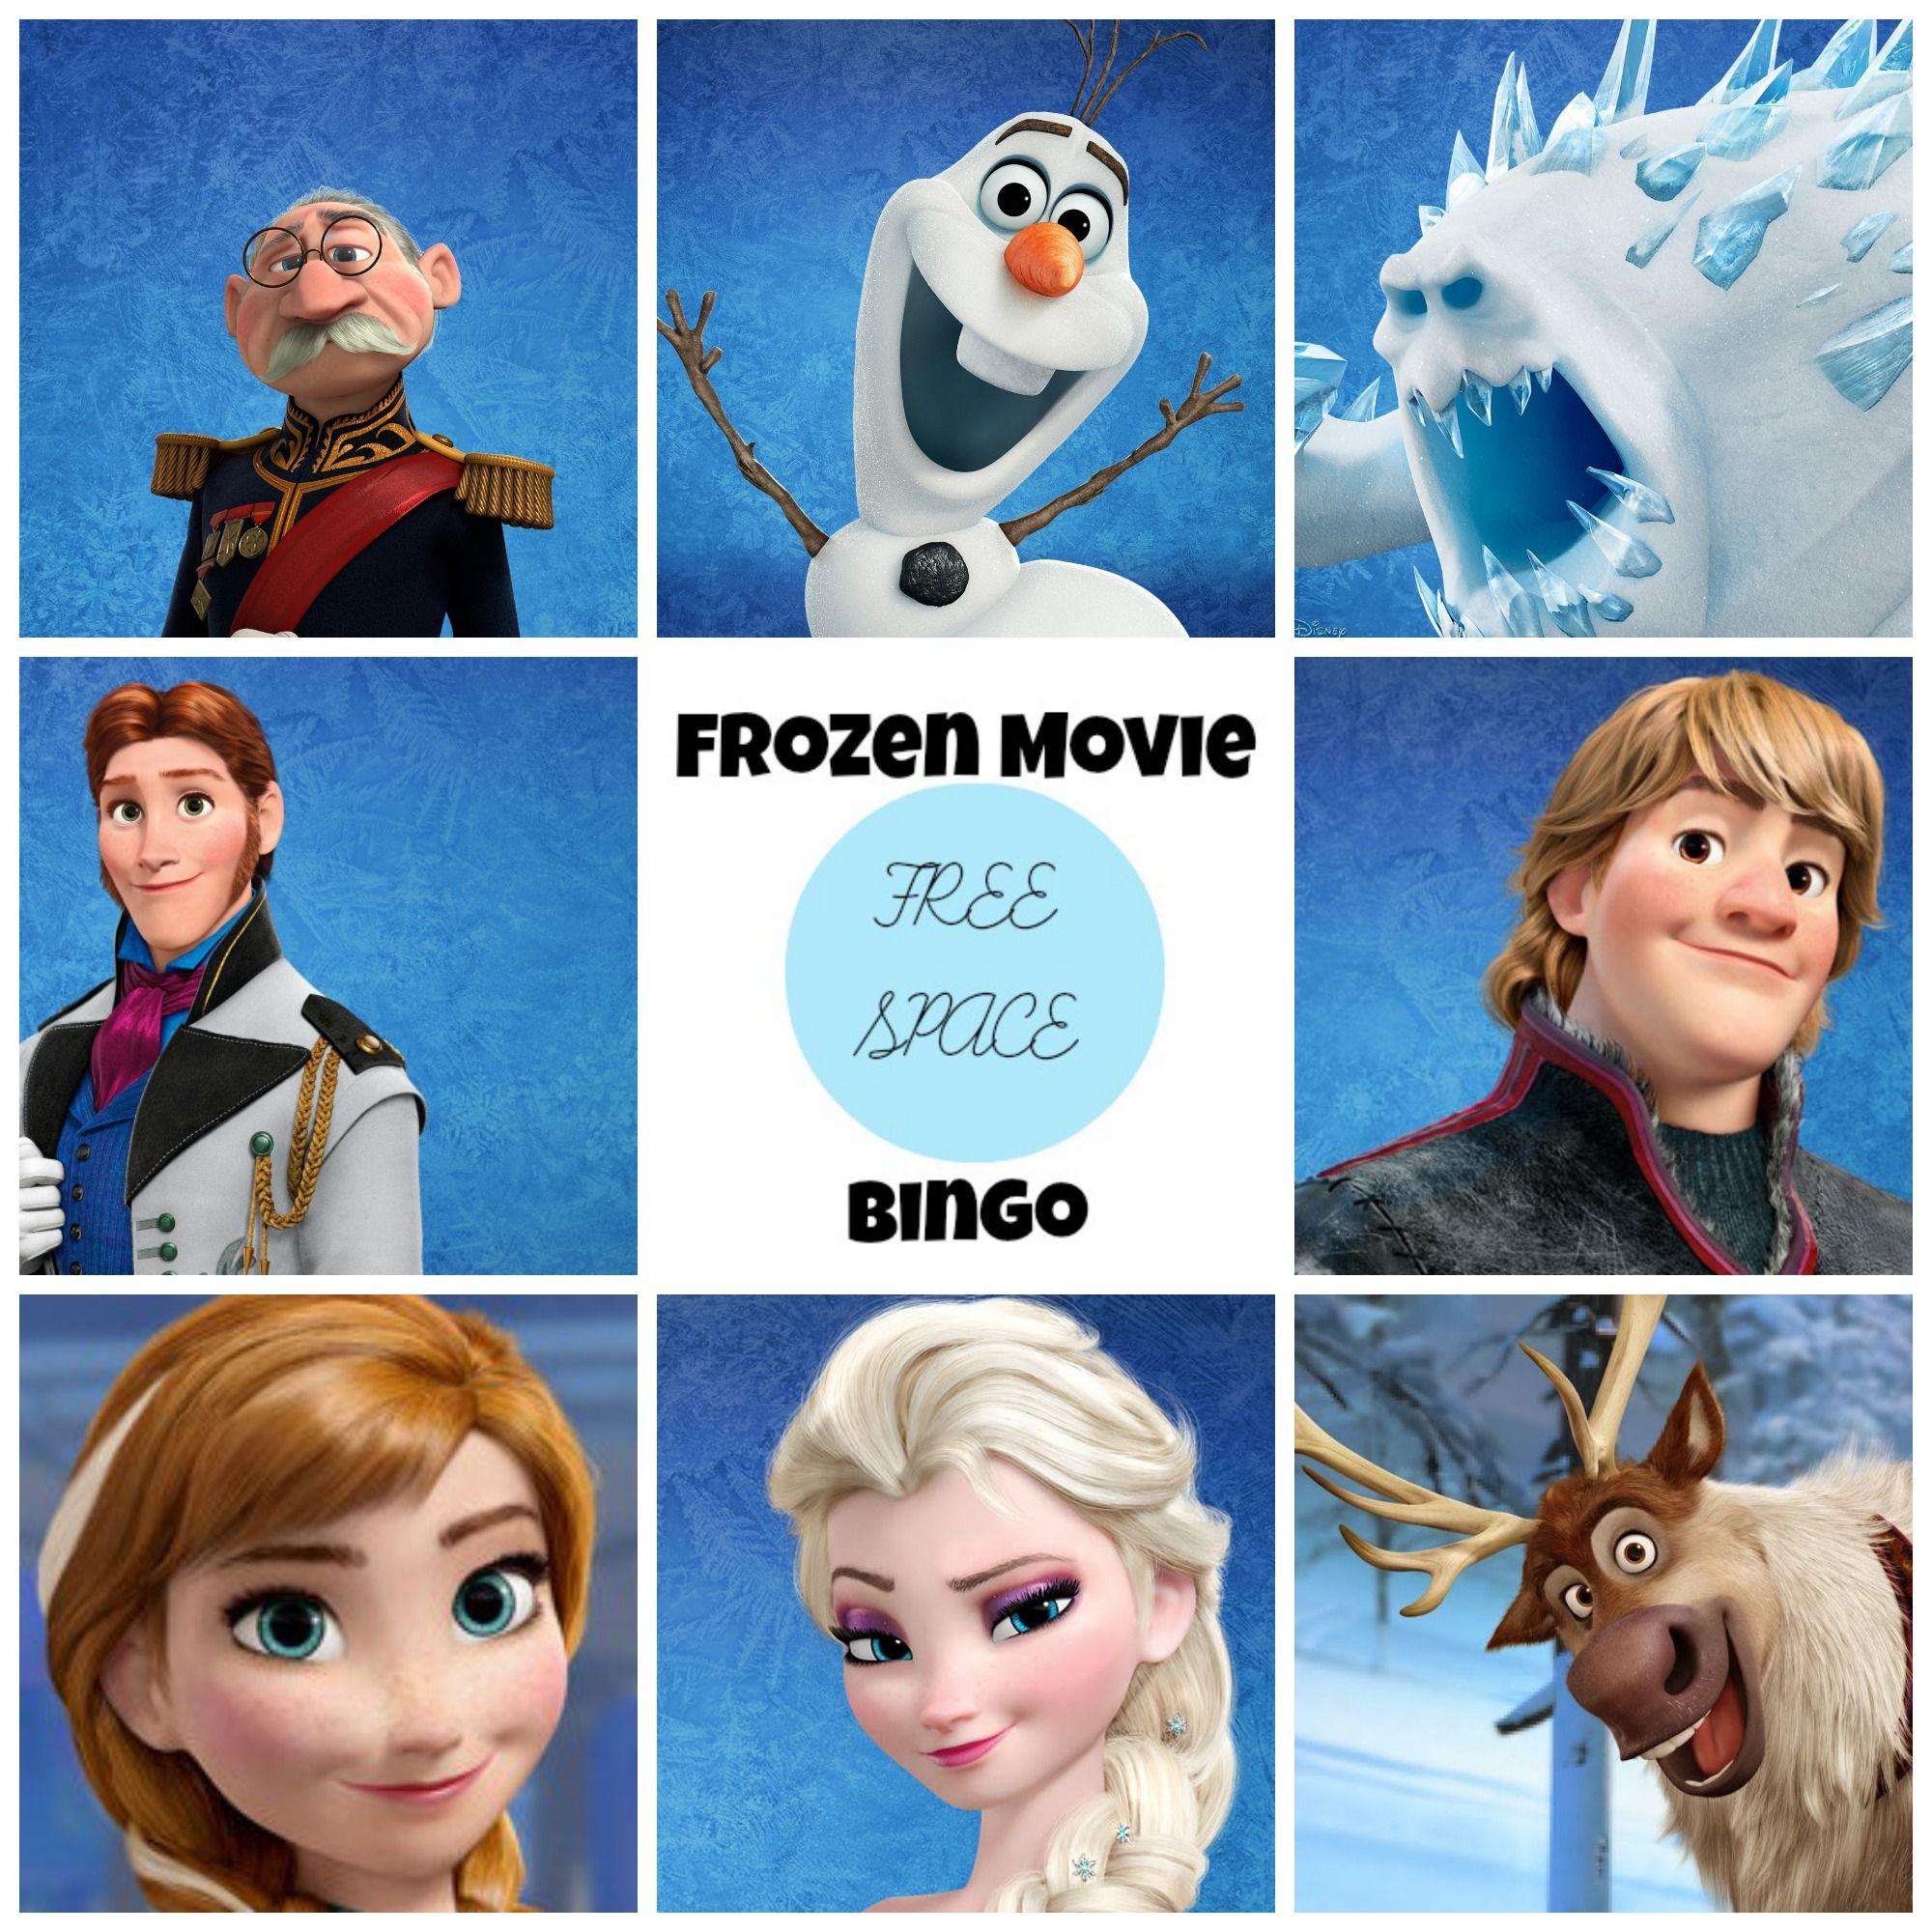 Frozen DVD Free Frozen Movie Bingo Game Printable